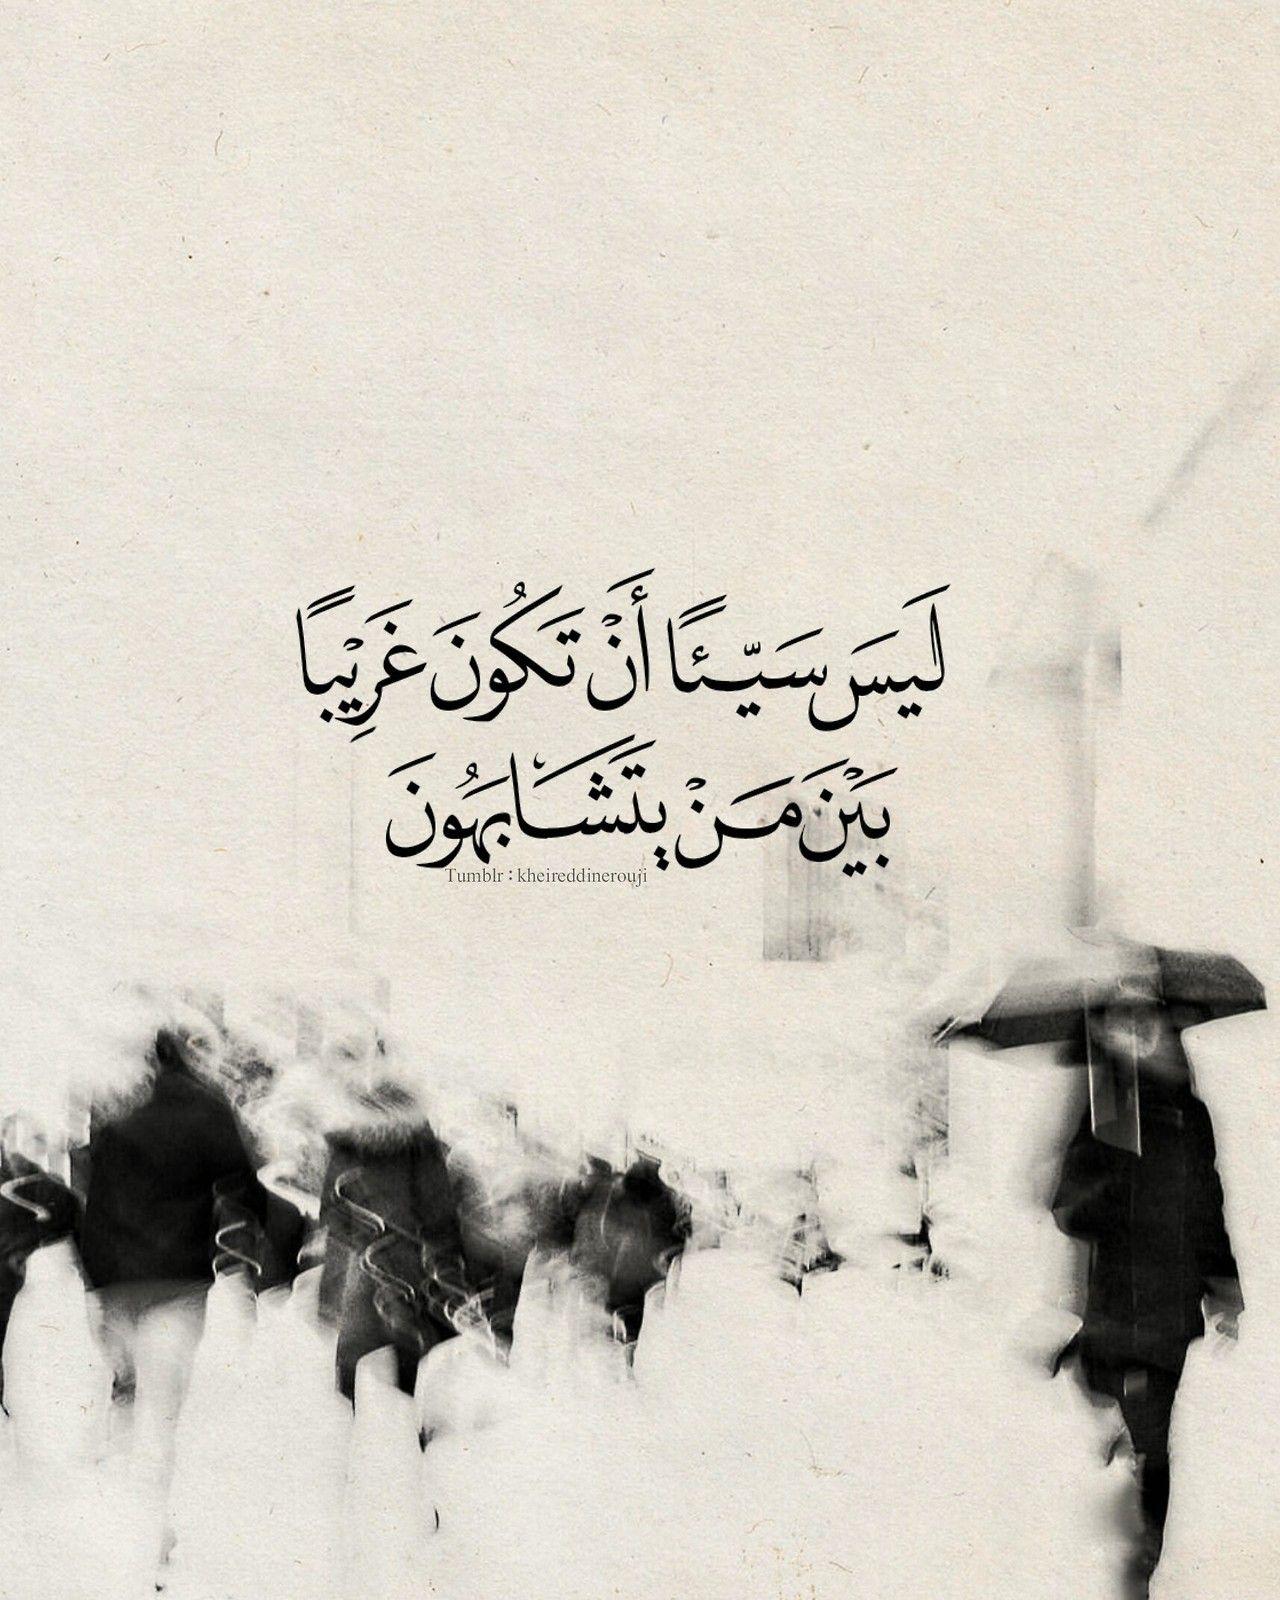 ليس سيئا أن تكون غريبا بين من يتشابهون Turkish Quotes Arabic Words Arabic Quotes